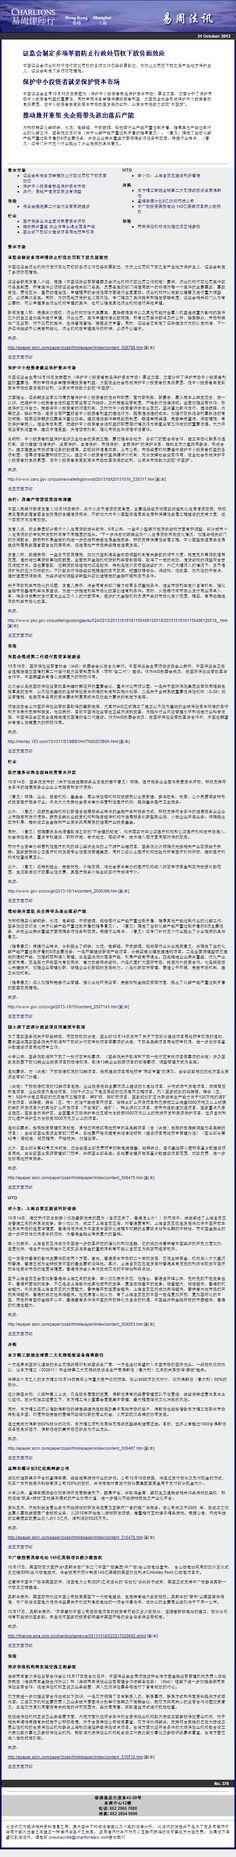 易周中国法讯 - 2013年10月21日 China News Alert - 21 October 2013